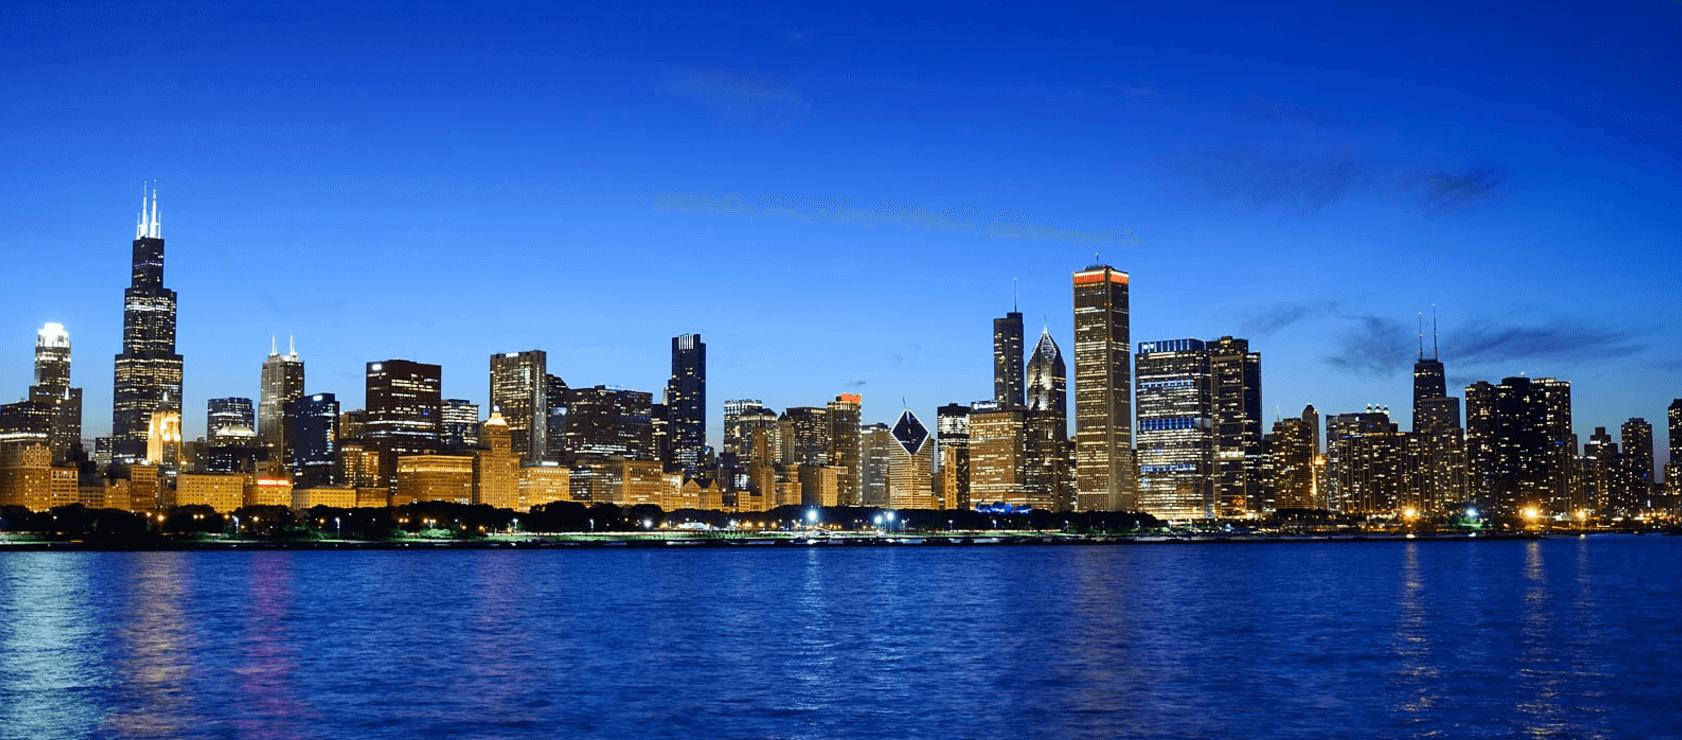 Report: What Makes a City a Sanctuary Now